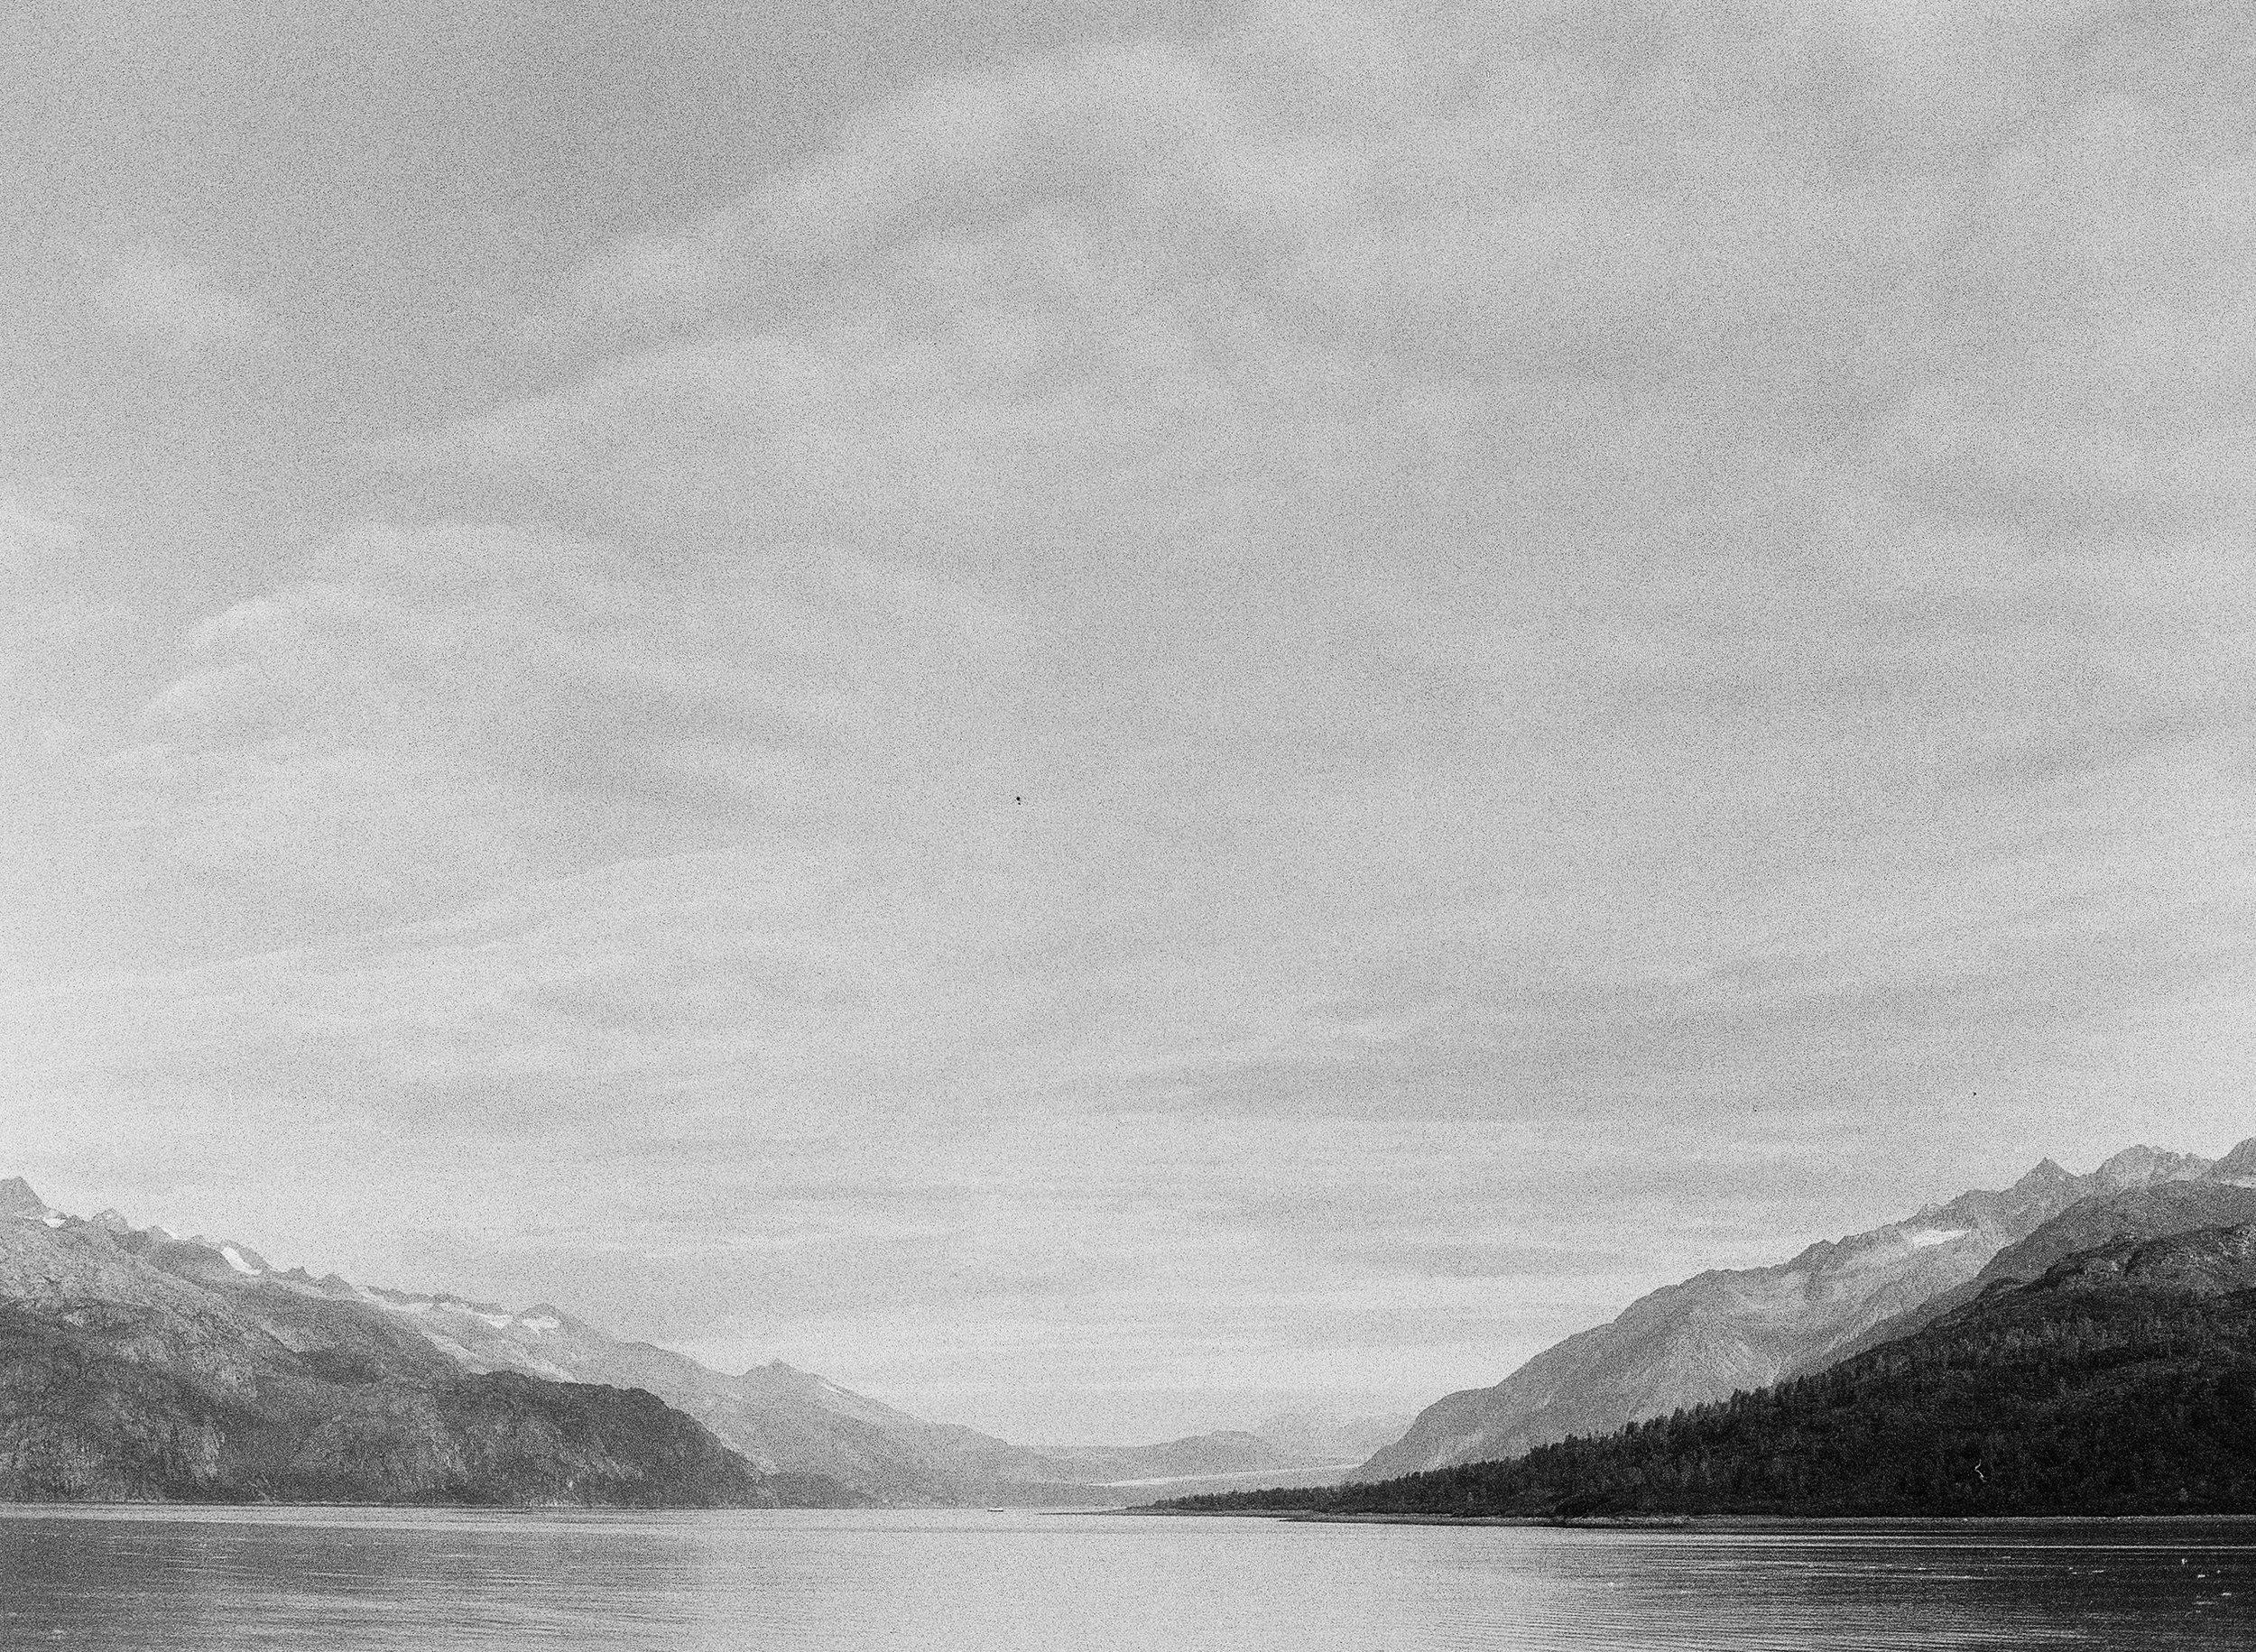 Alaska-Cruise-276-Jen_Huang-000001250005.jpg